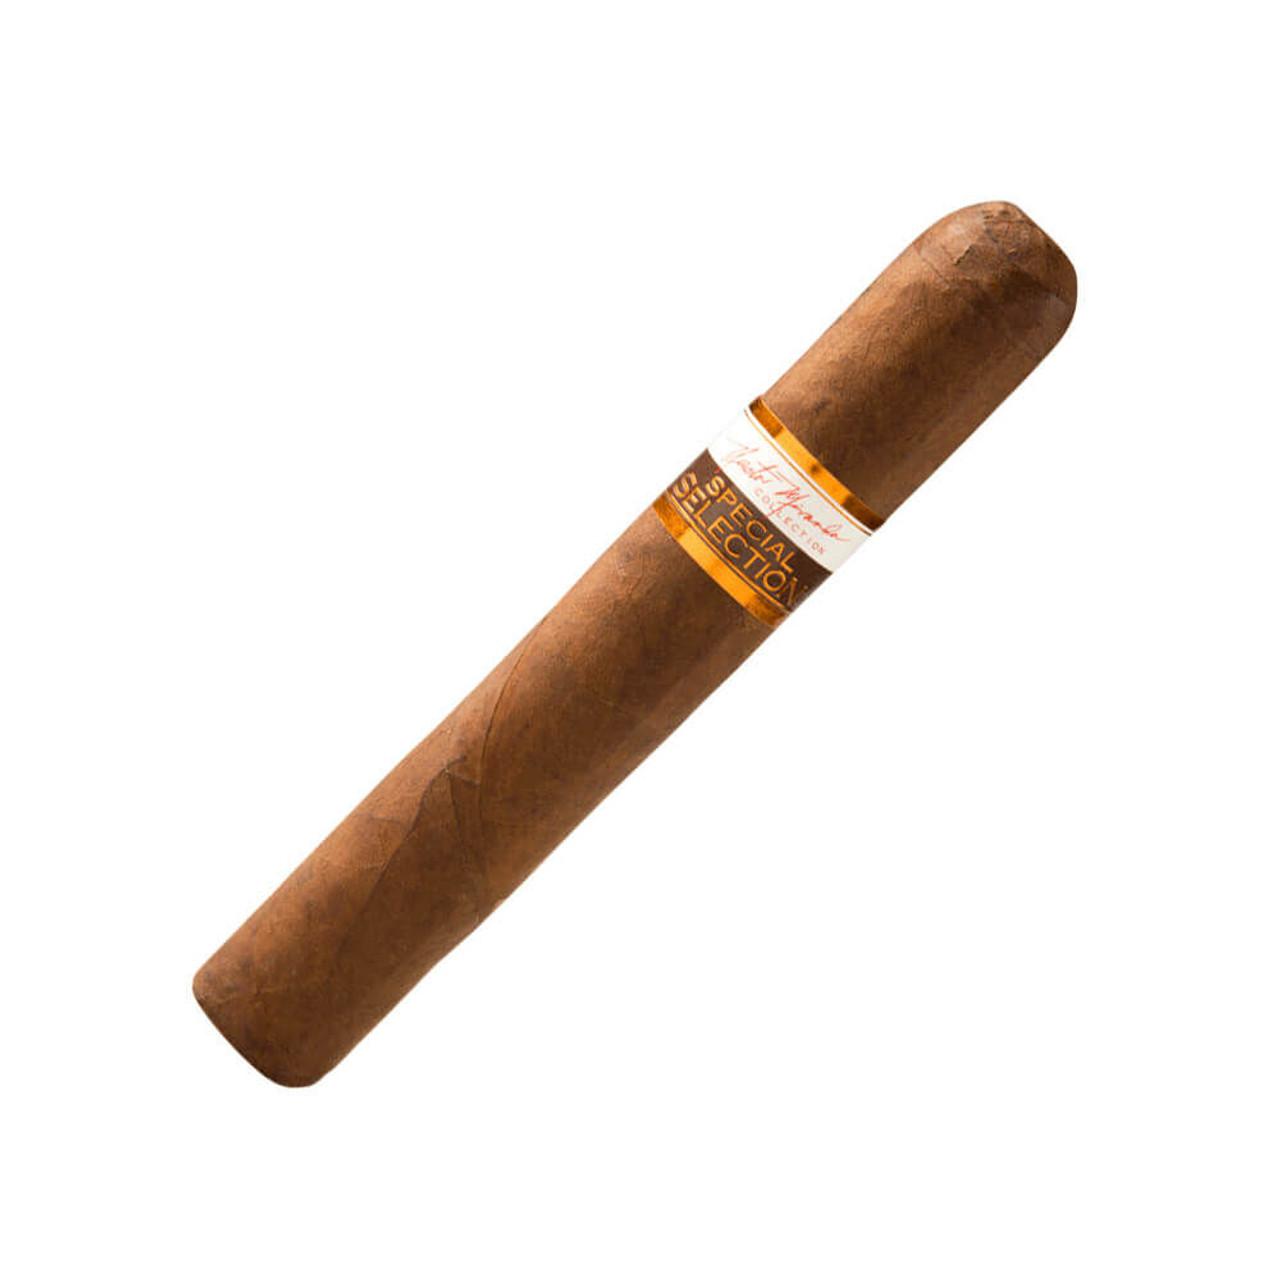 Nestor Miranda Special Selection Toro Cigars - 5.5 x 54 (Box of 20)